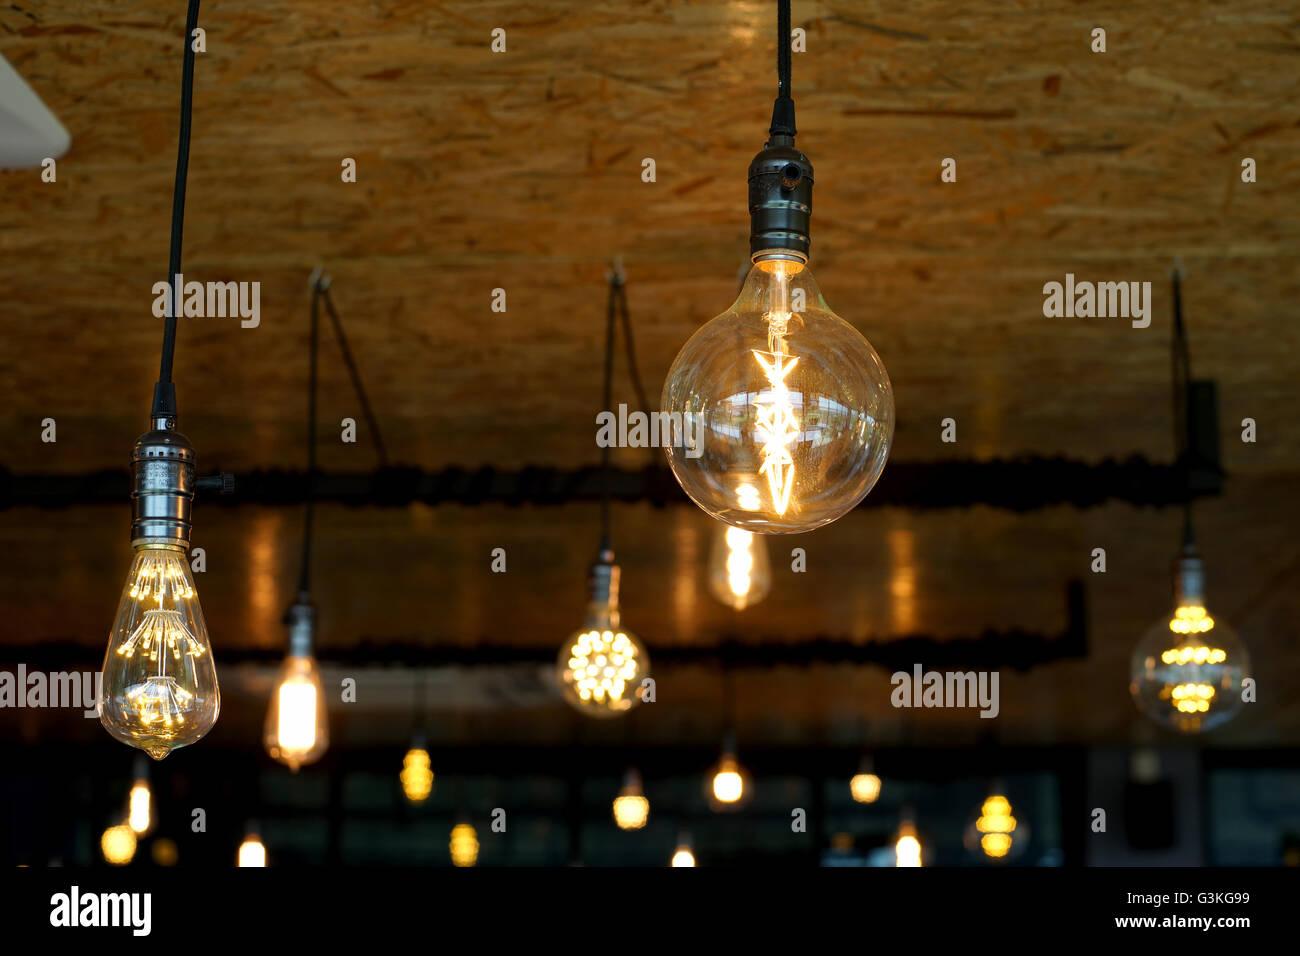 Decorative antique tungsten light bulbs hanging on ceiling stock decorative antique tungsten light bulbs hanging on ceiling aloadofball Choice Image